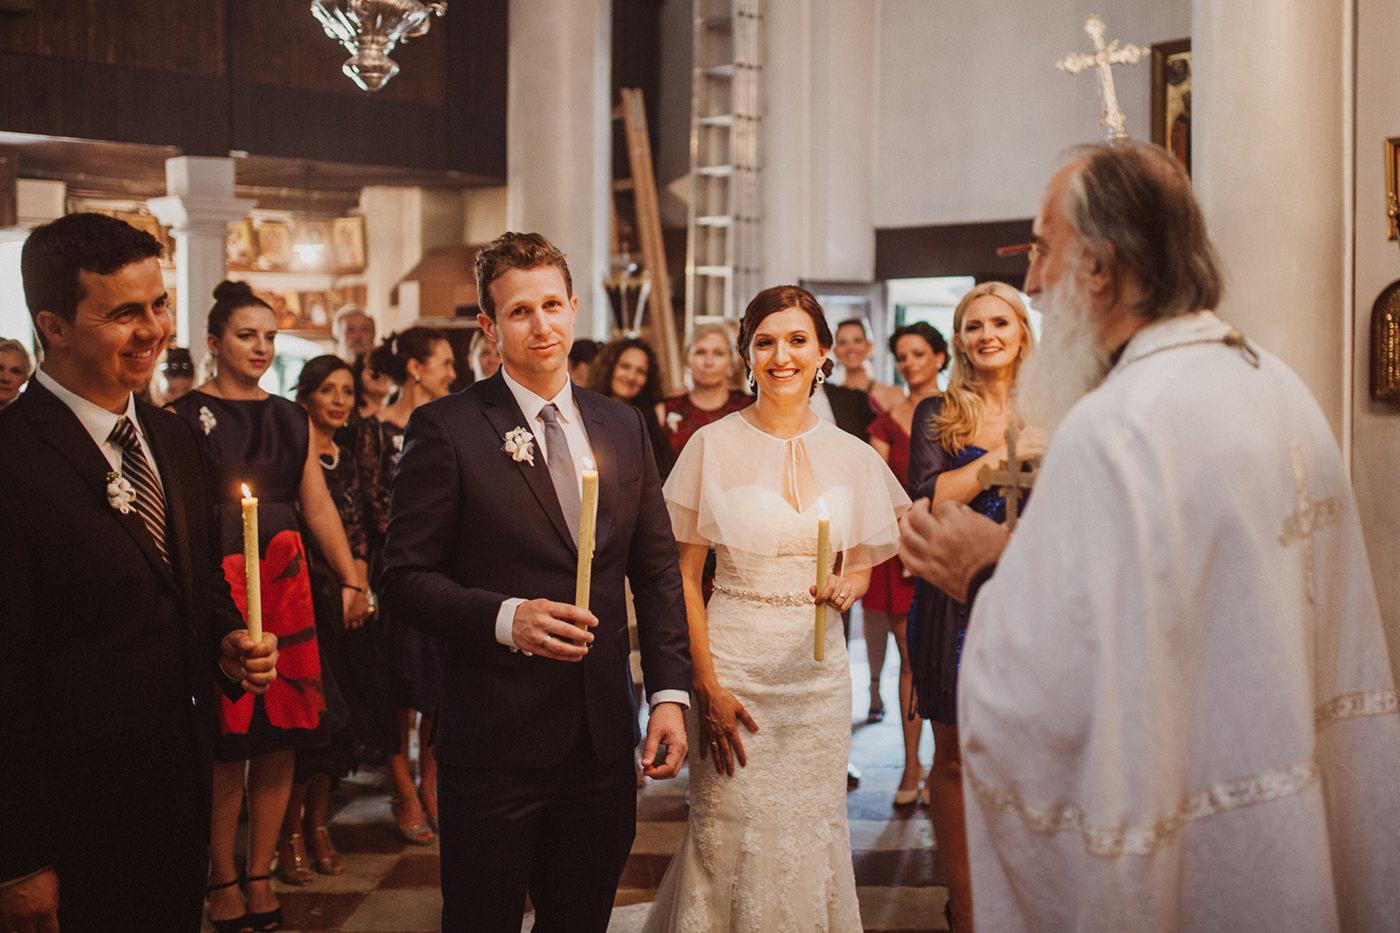 irena-ryan-destination-wedding-photographer-montenegro-kotor-0111